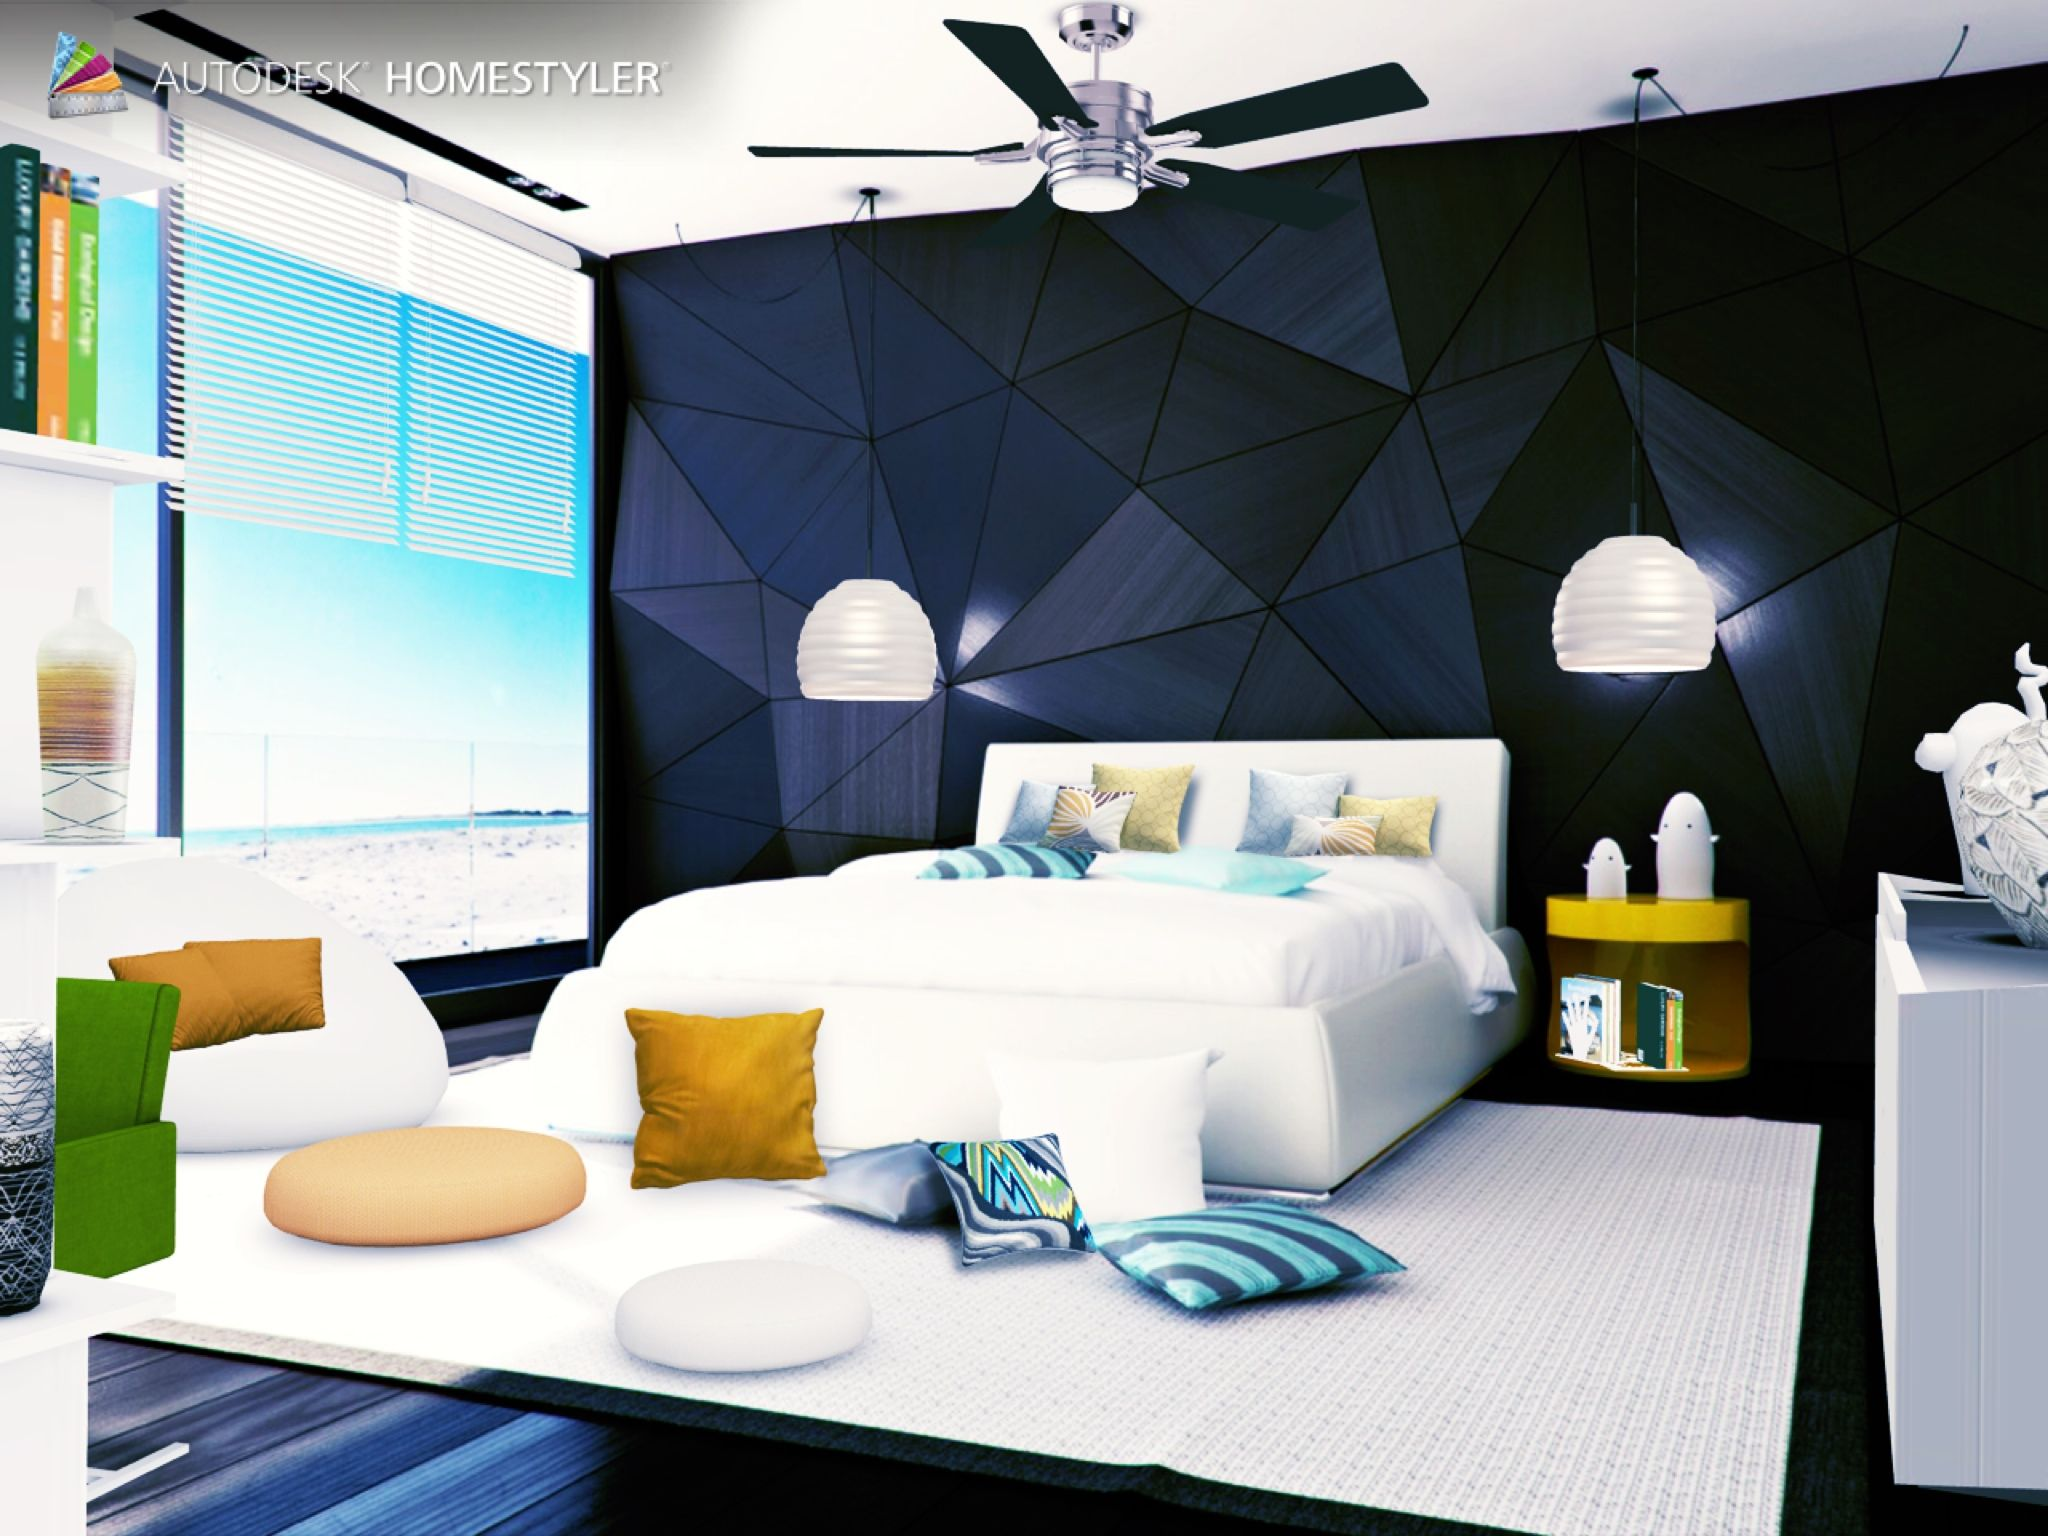 Ultra Modern Bedroom Design with Sea View | My 20 Best Bedroom ...